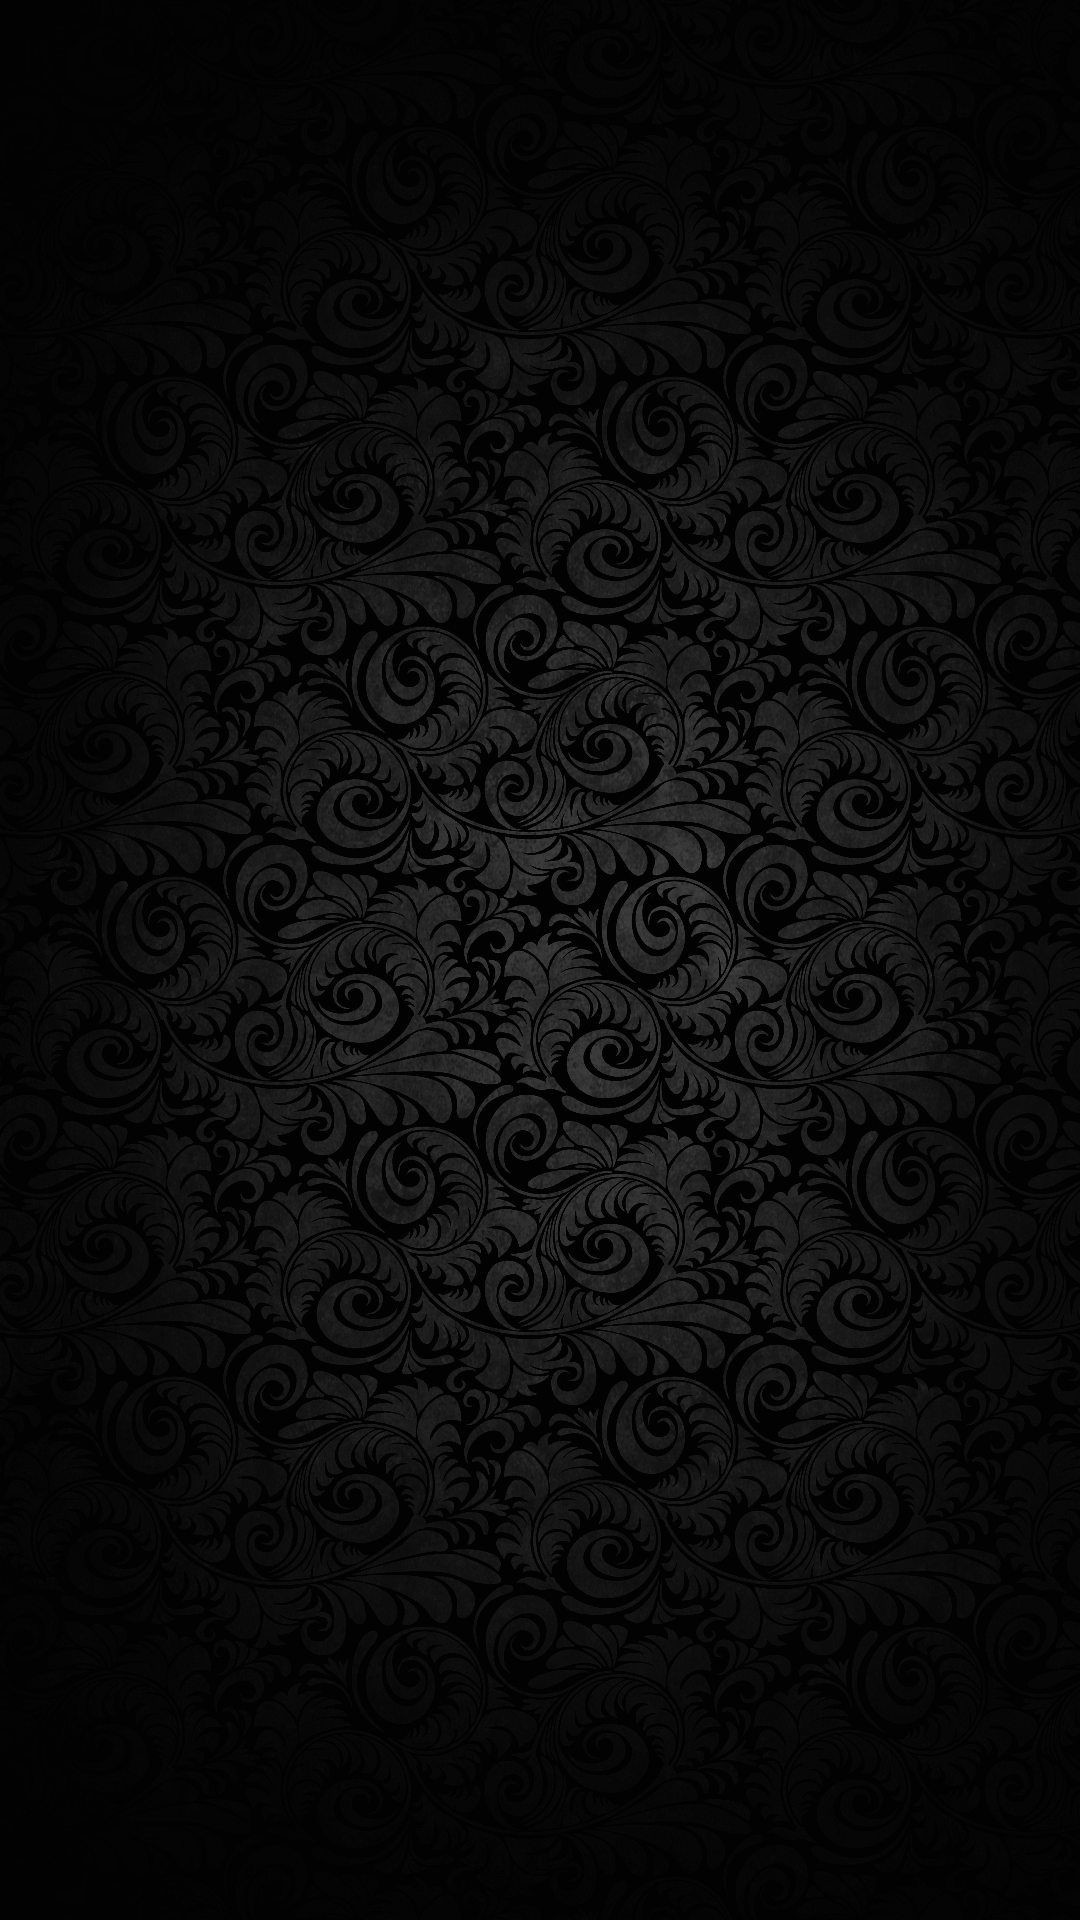 Res: 1080x1920, Wallpaper full hd 1080 x 1920 smartphone dark elegant